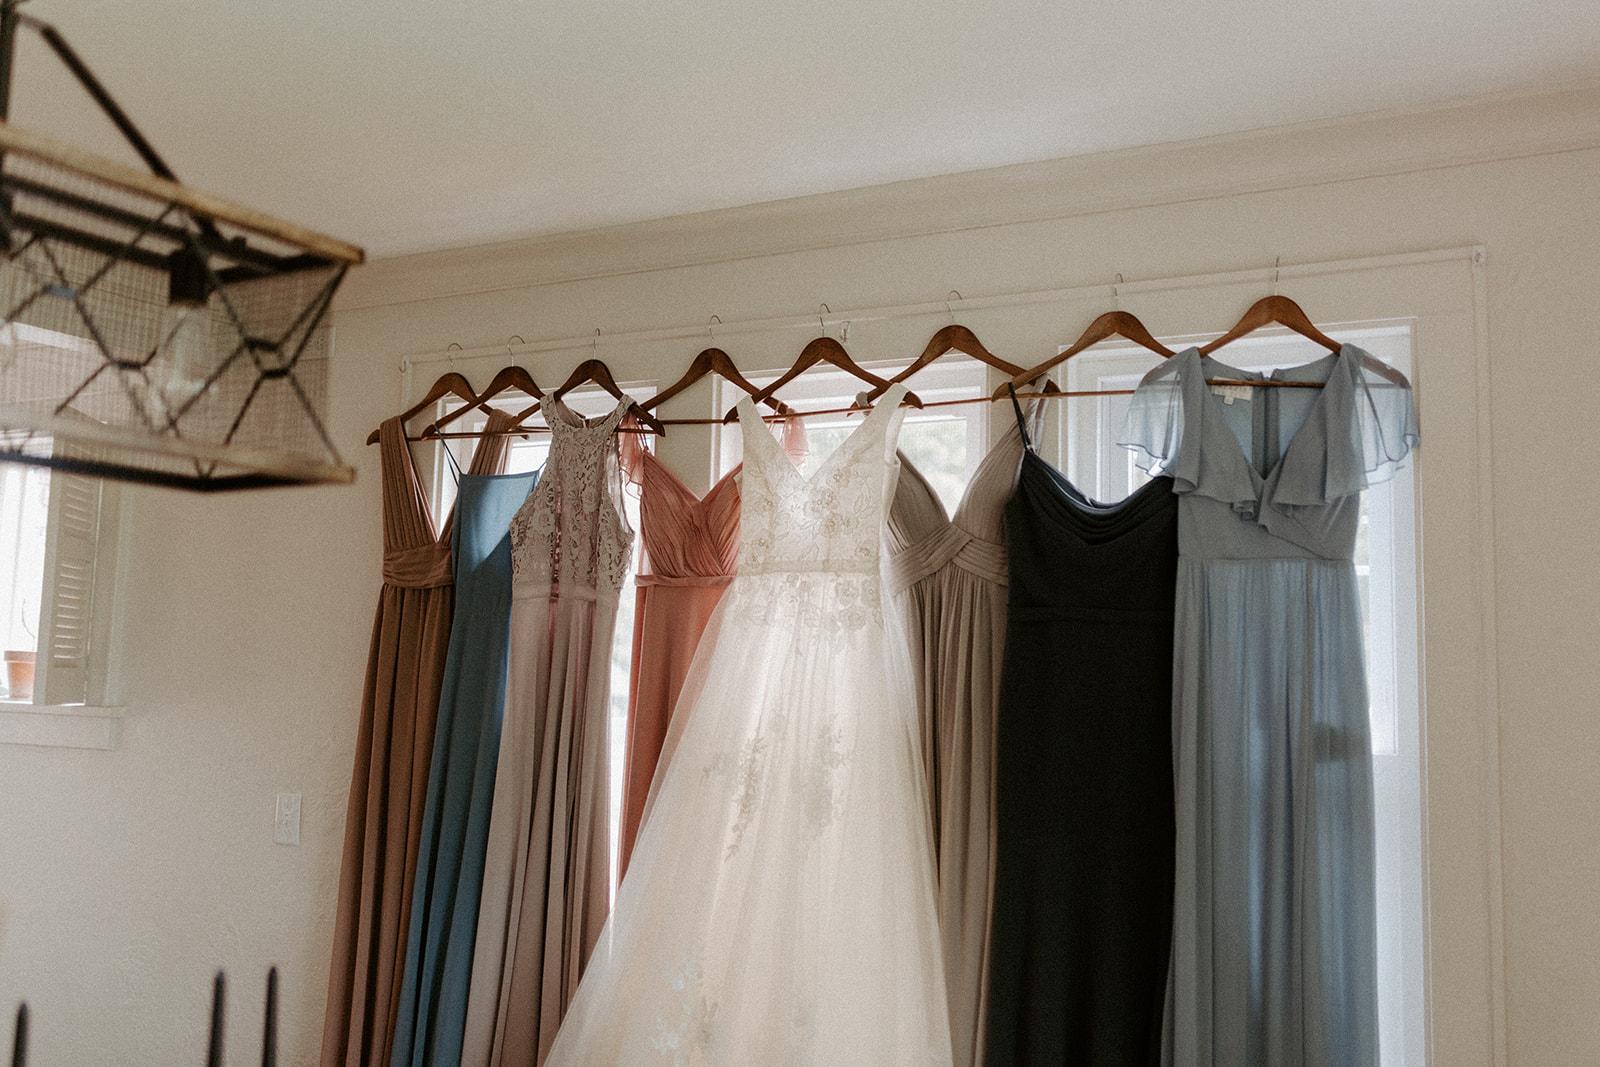 camp_wokanda_peoria_illinois_wedding_photographer_wright_photographs_bliese_0033.jpg